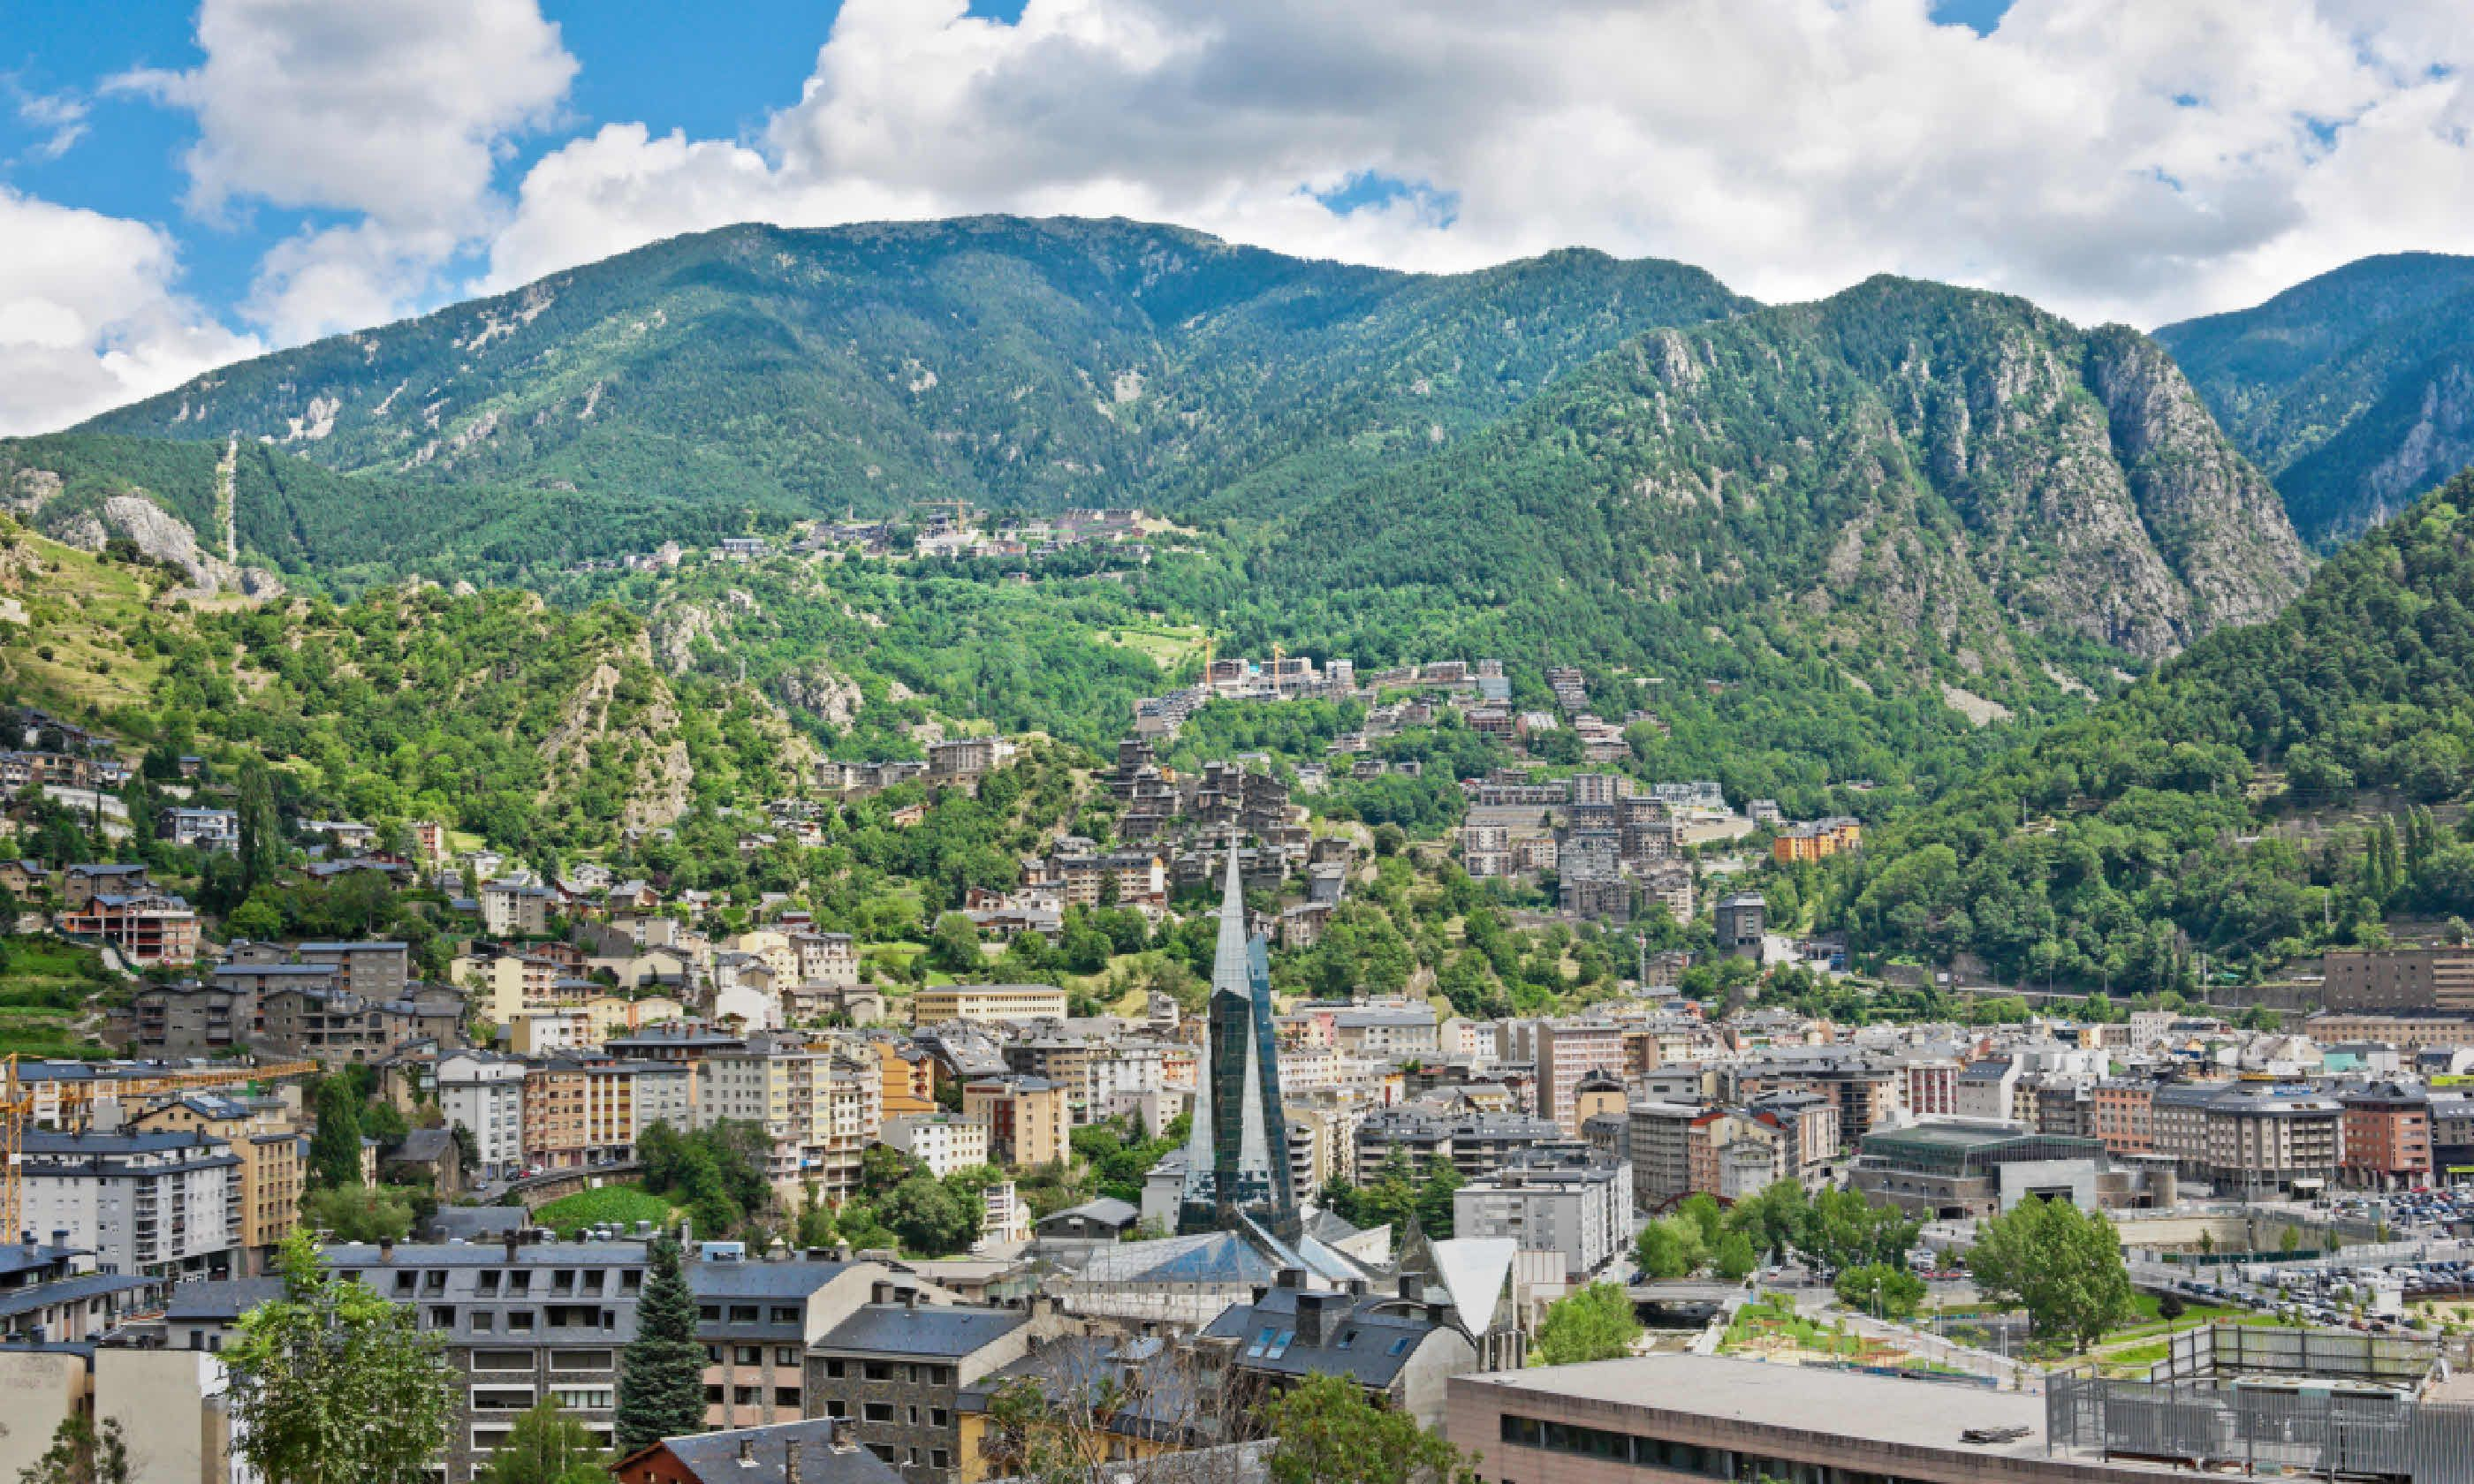 Andorra la Vella, Andorra (Shutterstock)